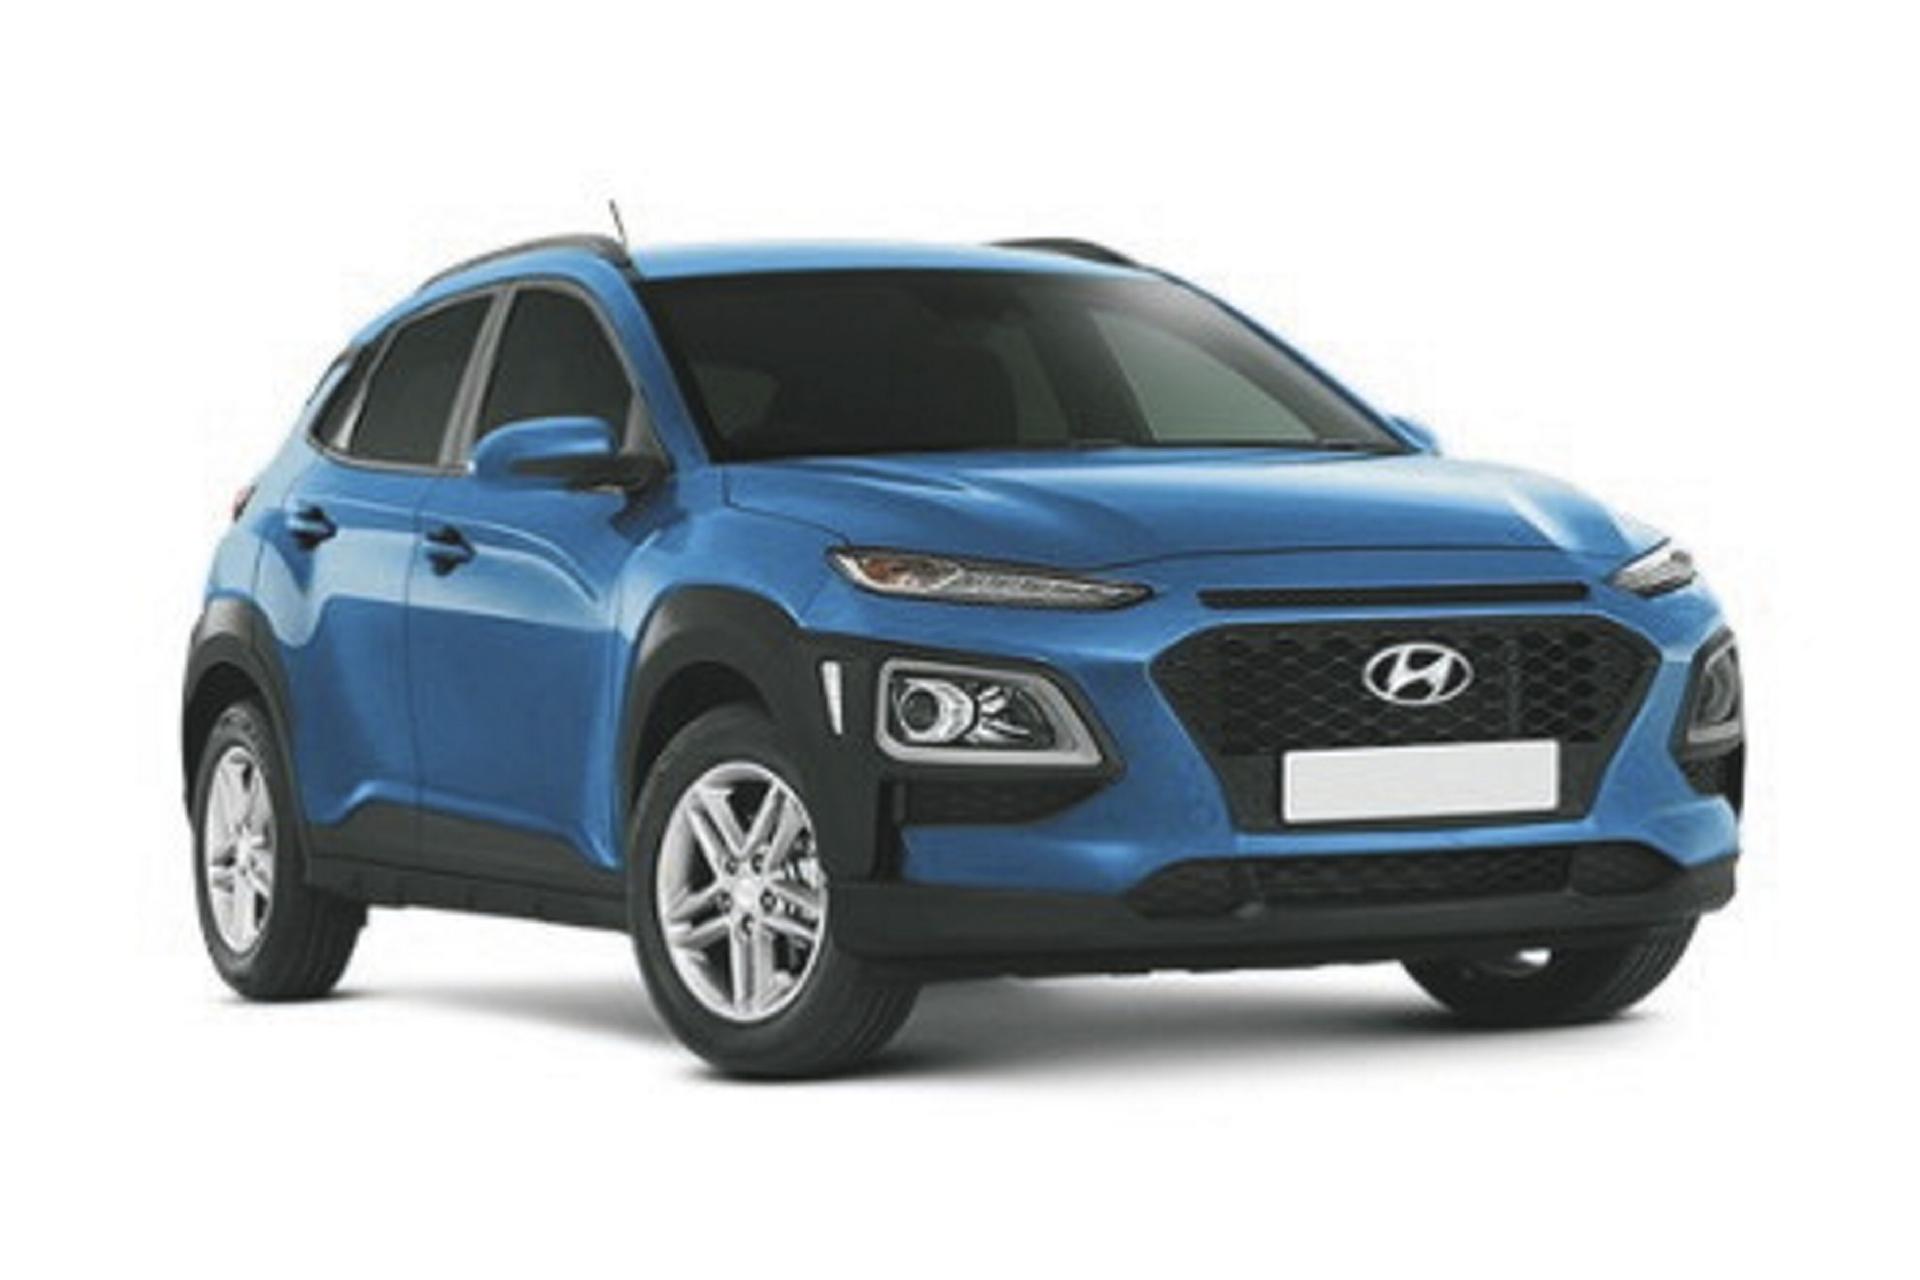 Kat. IFAR, Hyundai Kona o.ä.